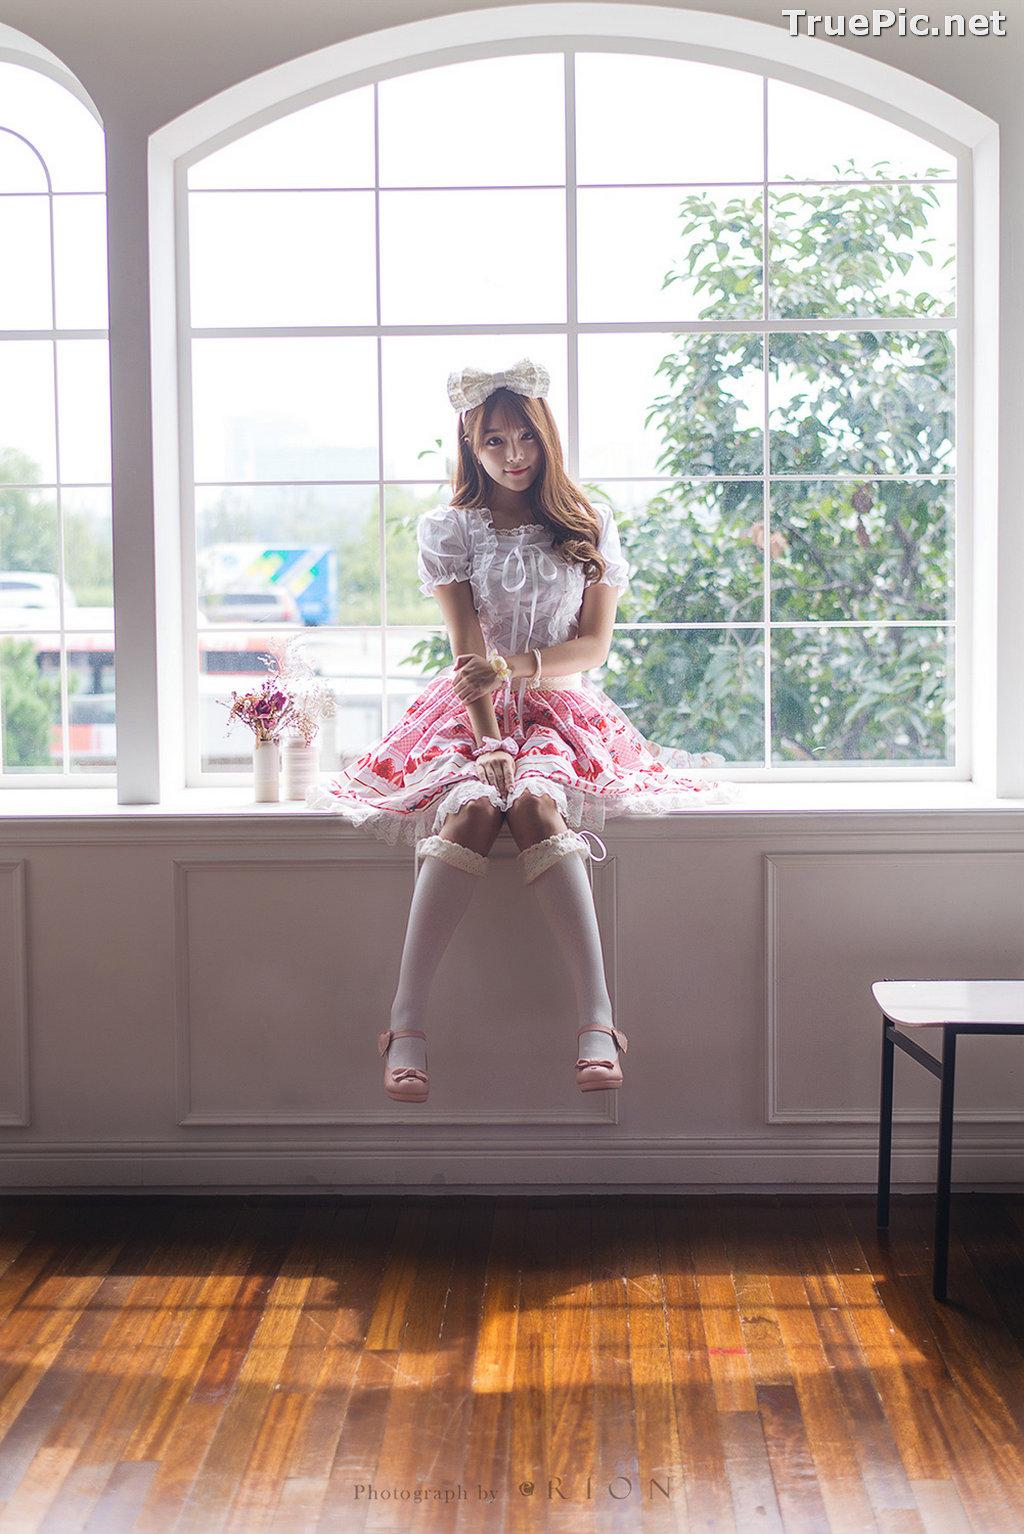 Image Korean Beautiful Model - Ji Yeon - My Cute Princess - TruePic.net - Picture-3